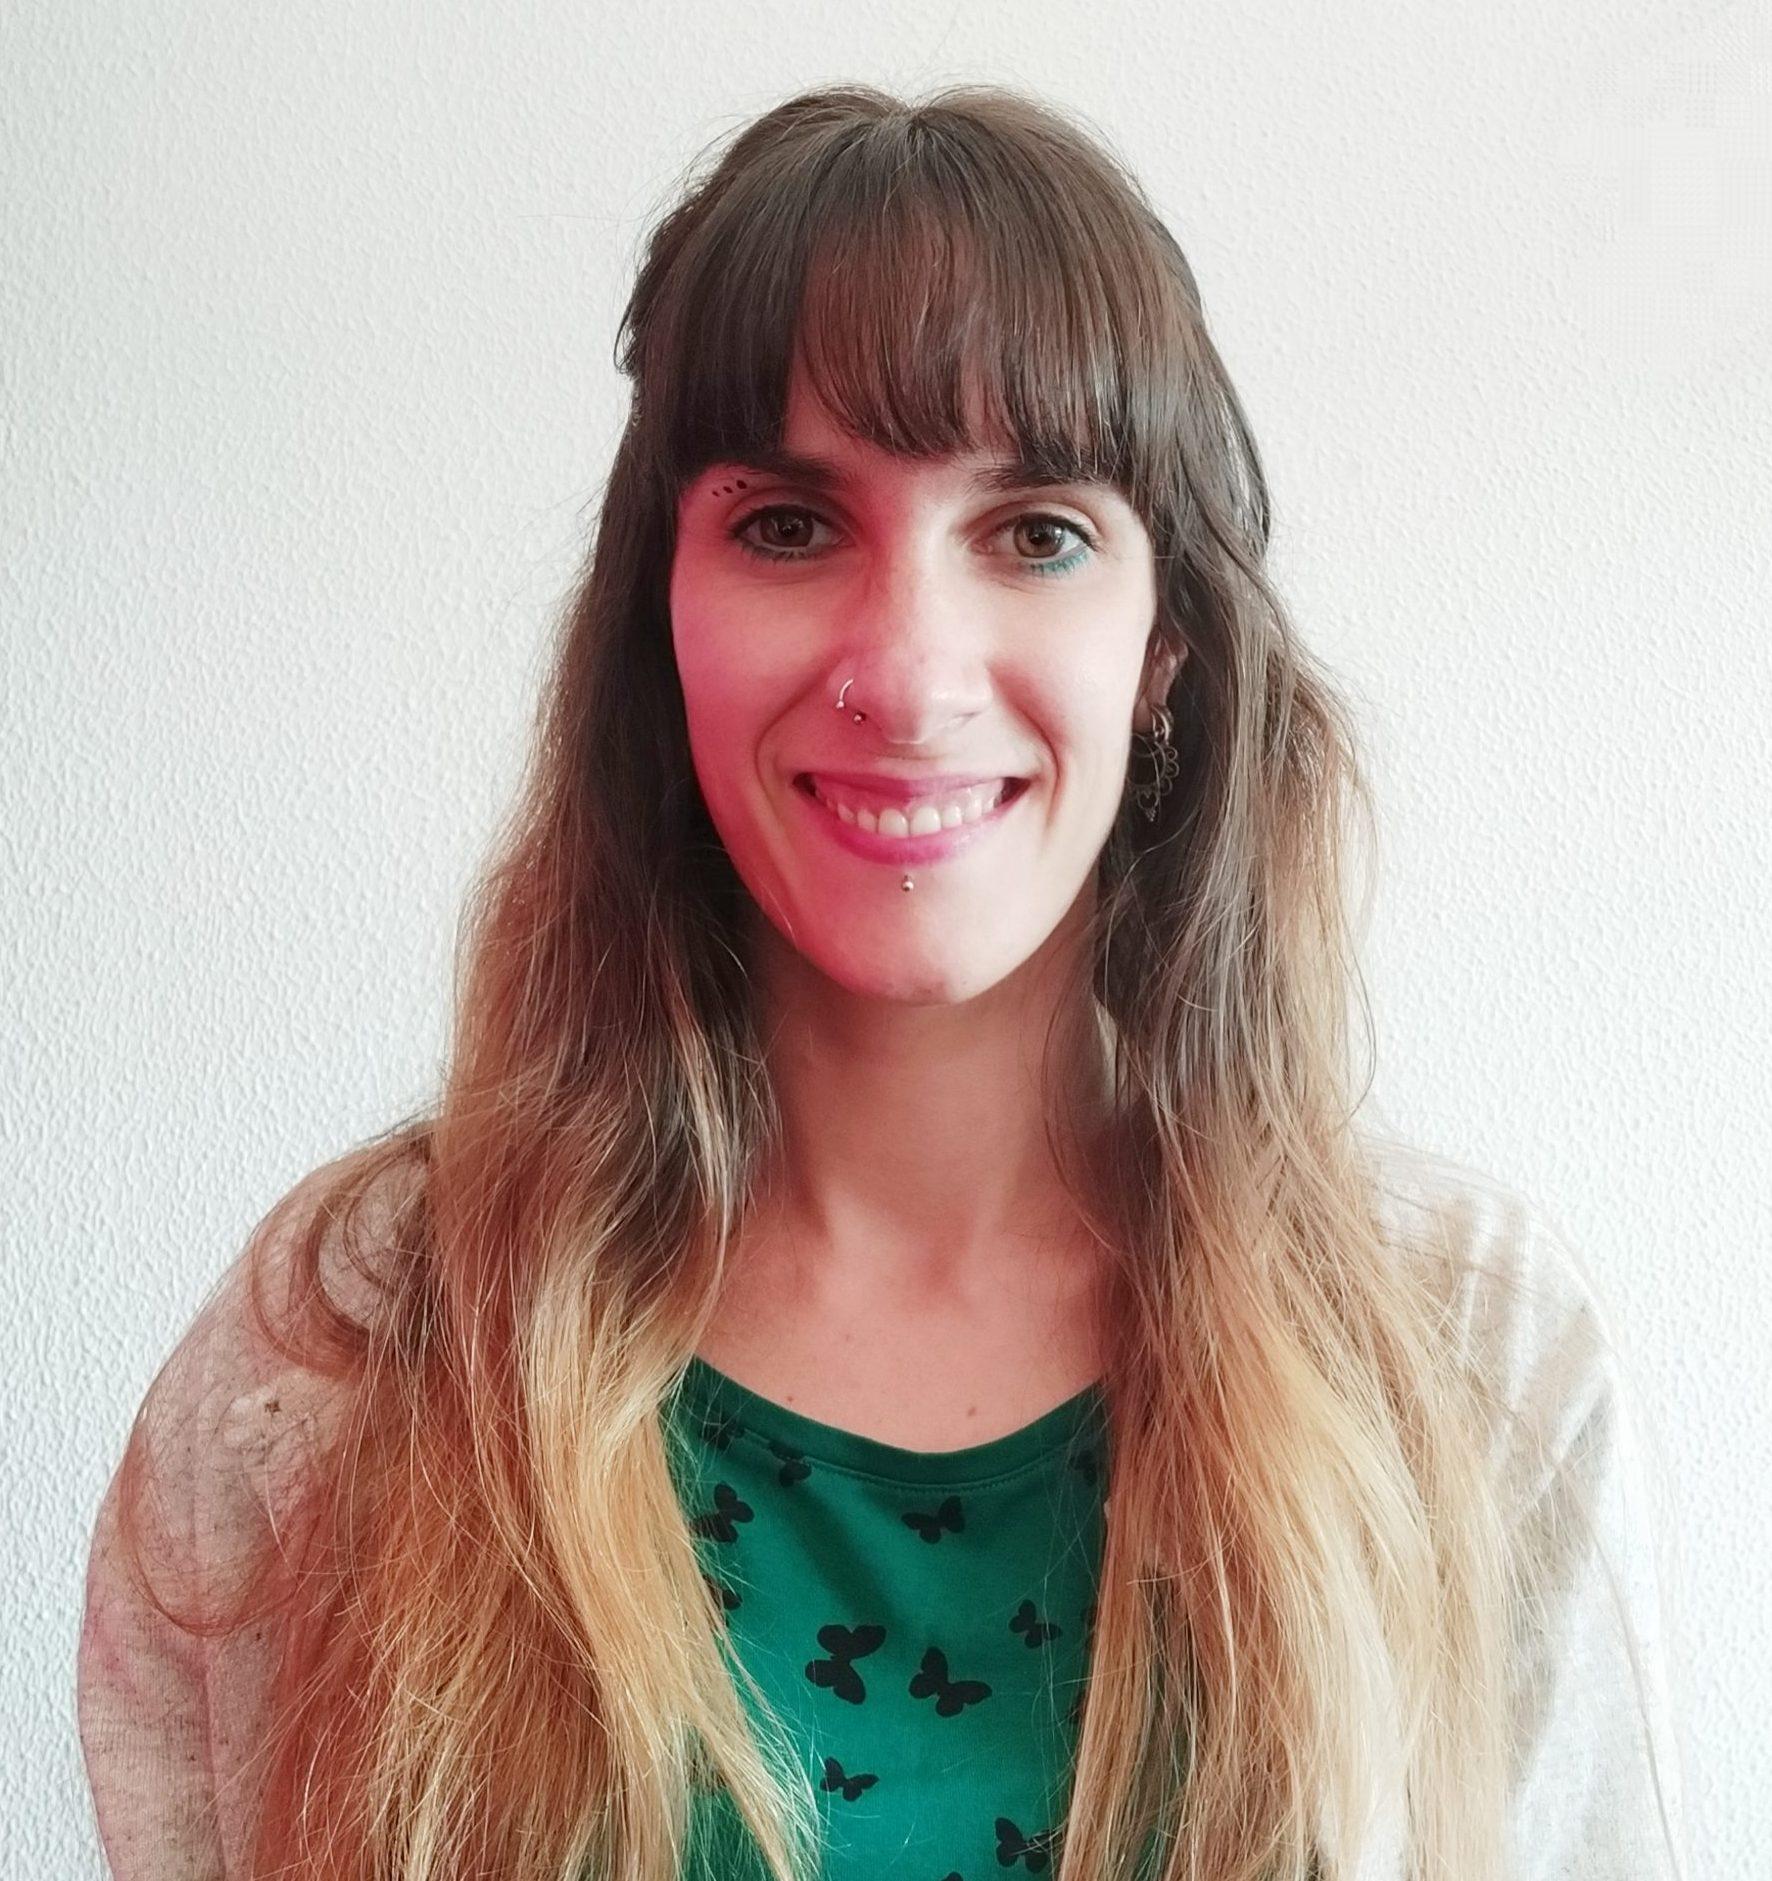 Ana Cristina Díez de la Flor